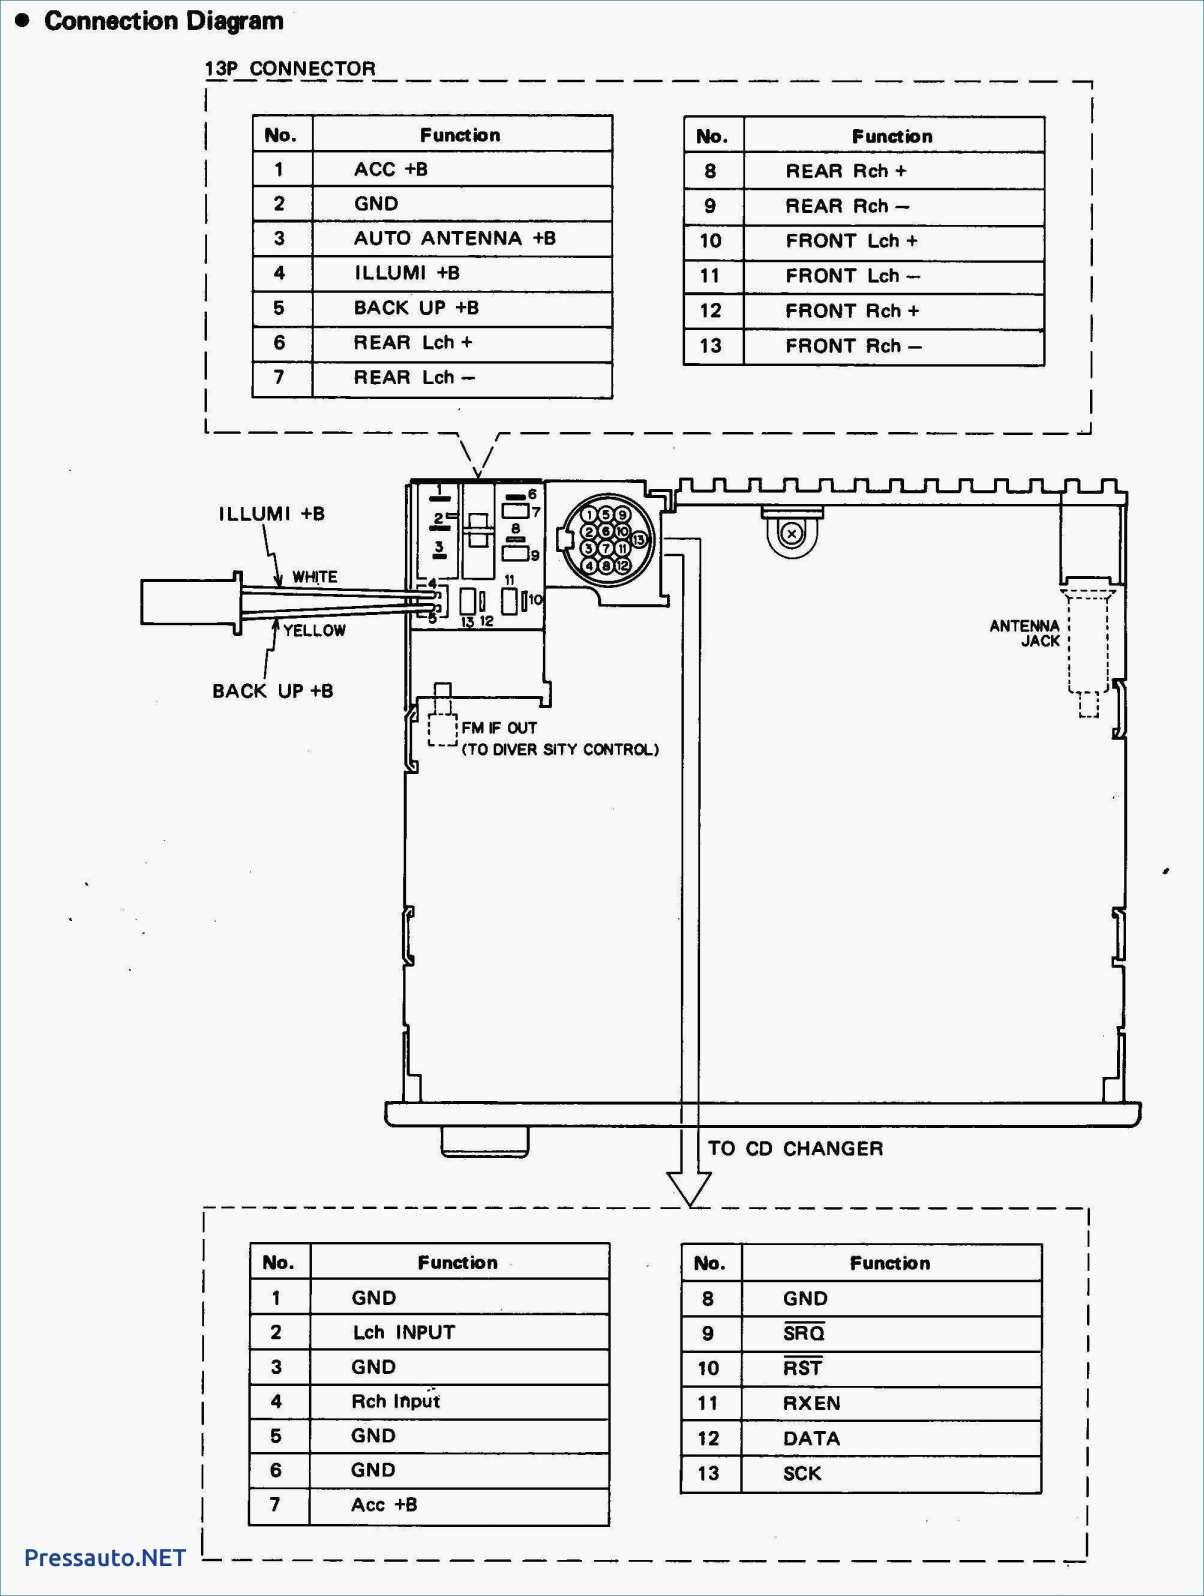 Car Radio Wiring Harness Diagram and Stereo Wiring Harness Diagram | Wiring  Library in 2020 | Diagram, Bmw e46, Manual carPinterest